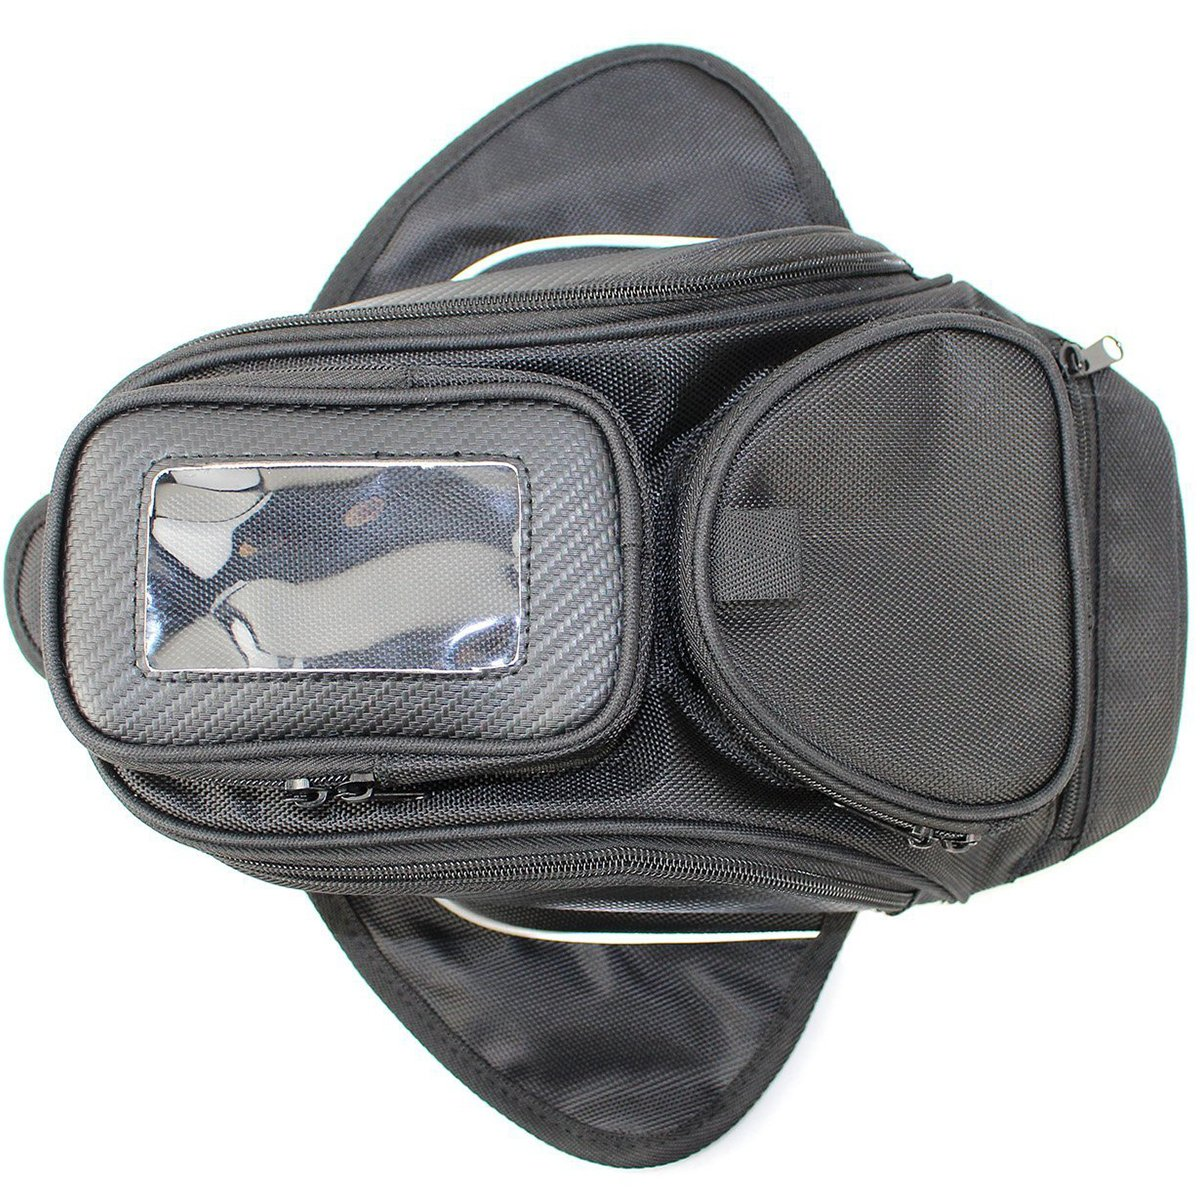 Universal Motorcycle Tank Bag Waterproof, Motorbike Oil Fuel Tank Bag Magnetic Motorbike Riding Bag Case by Amhousejoy (Black)